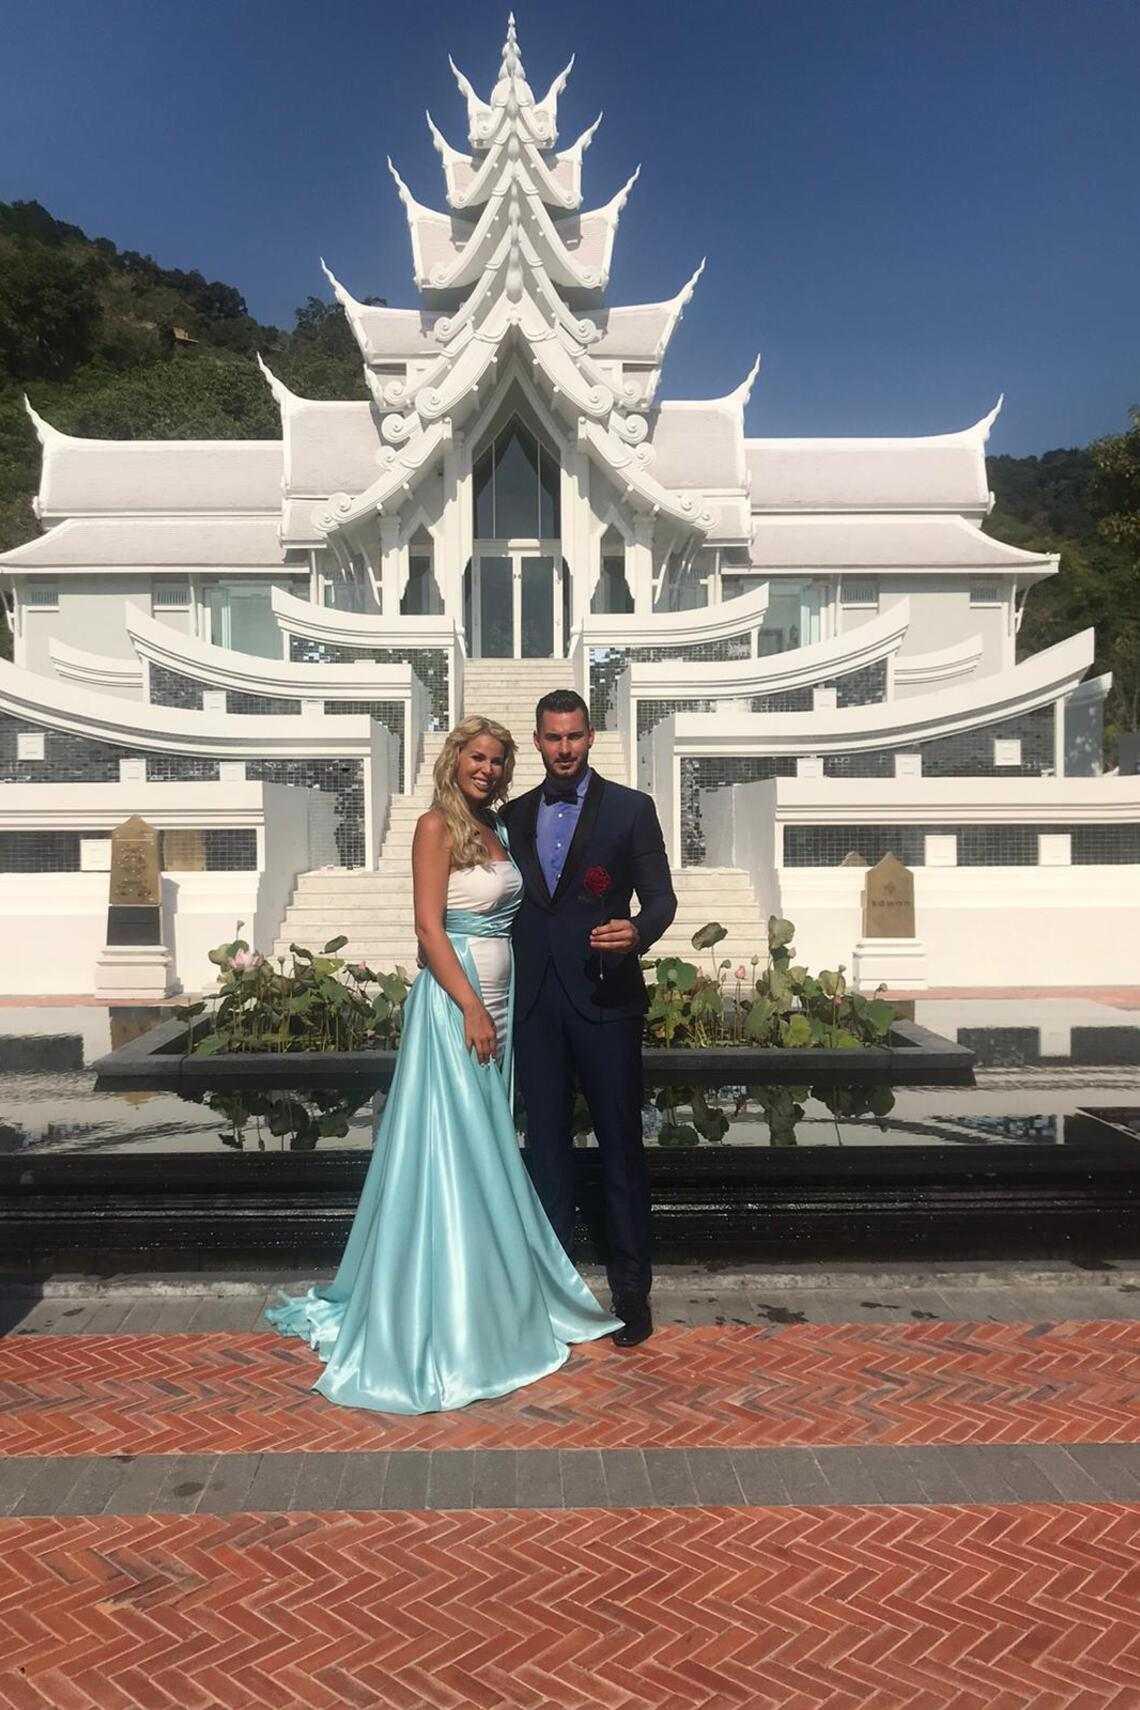 Chanelle und Mike (Bachelorette 2020)